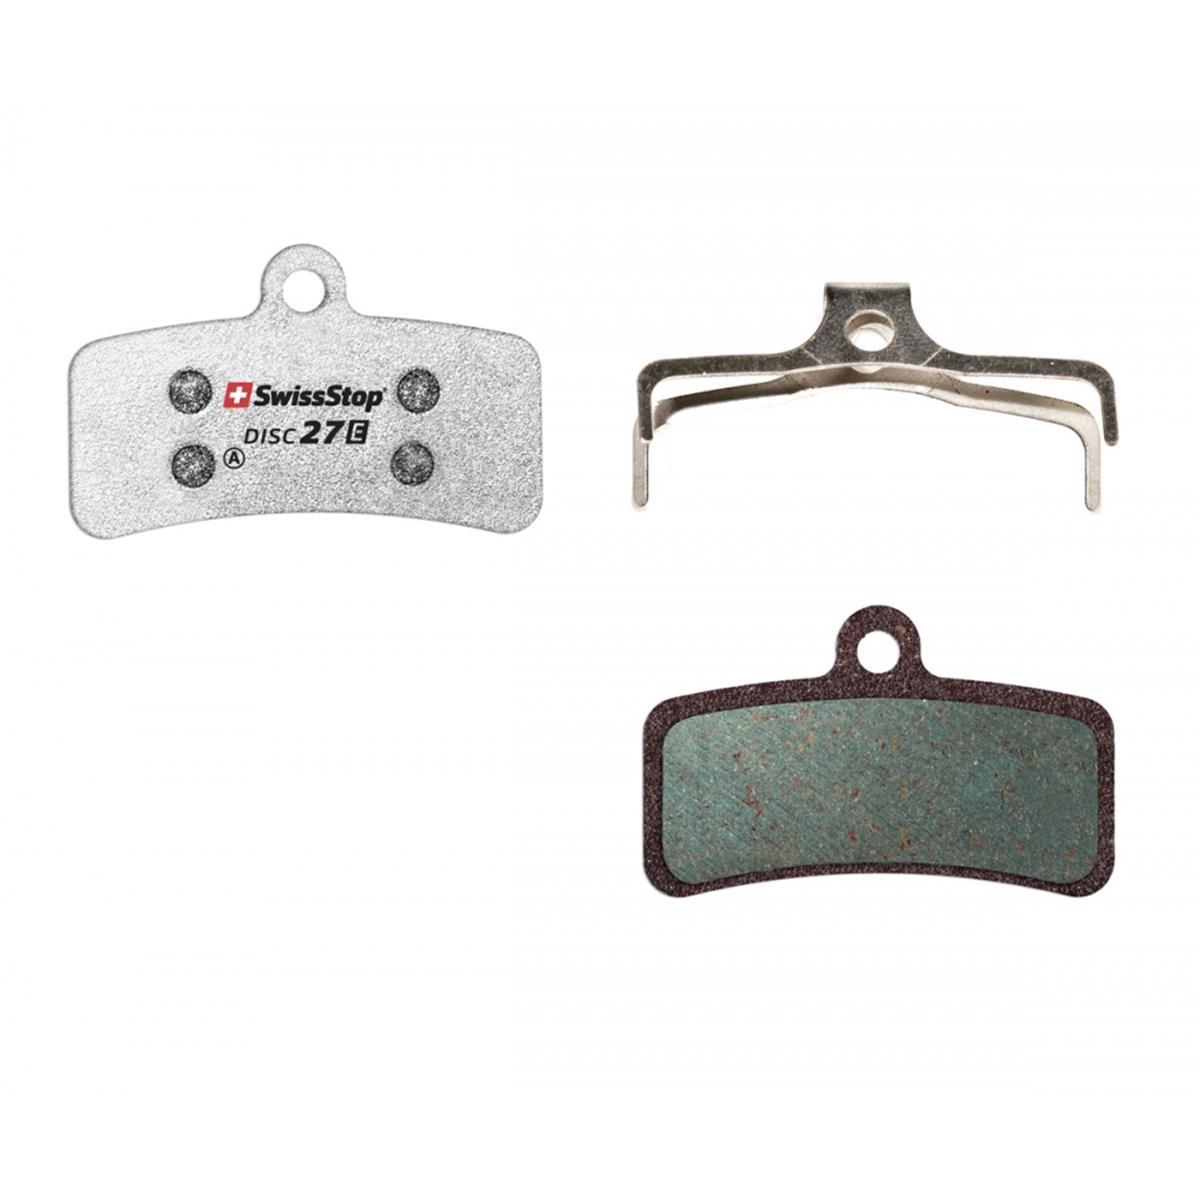 SwissStop Bike-Bremsbelag DISC27E E-Bike, Organisch, Für Shimano Saint, TRP Quadiem, SL, Slate T4